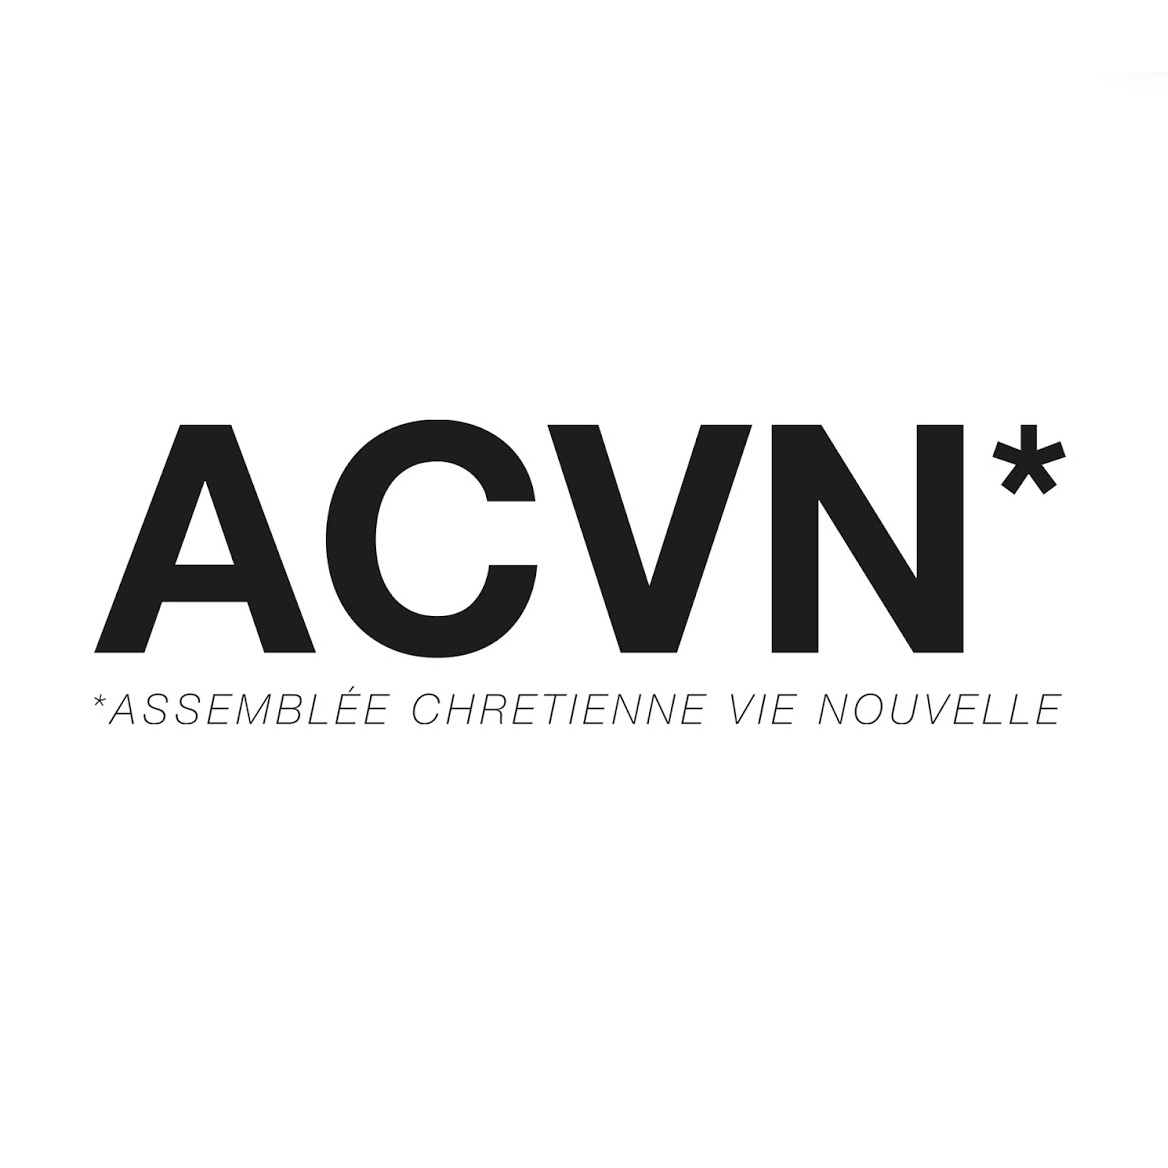 L'ACVN